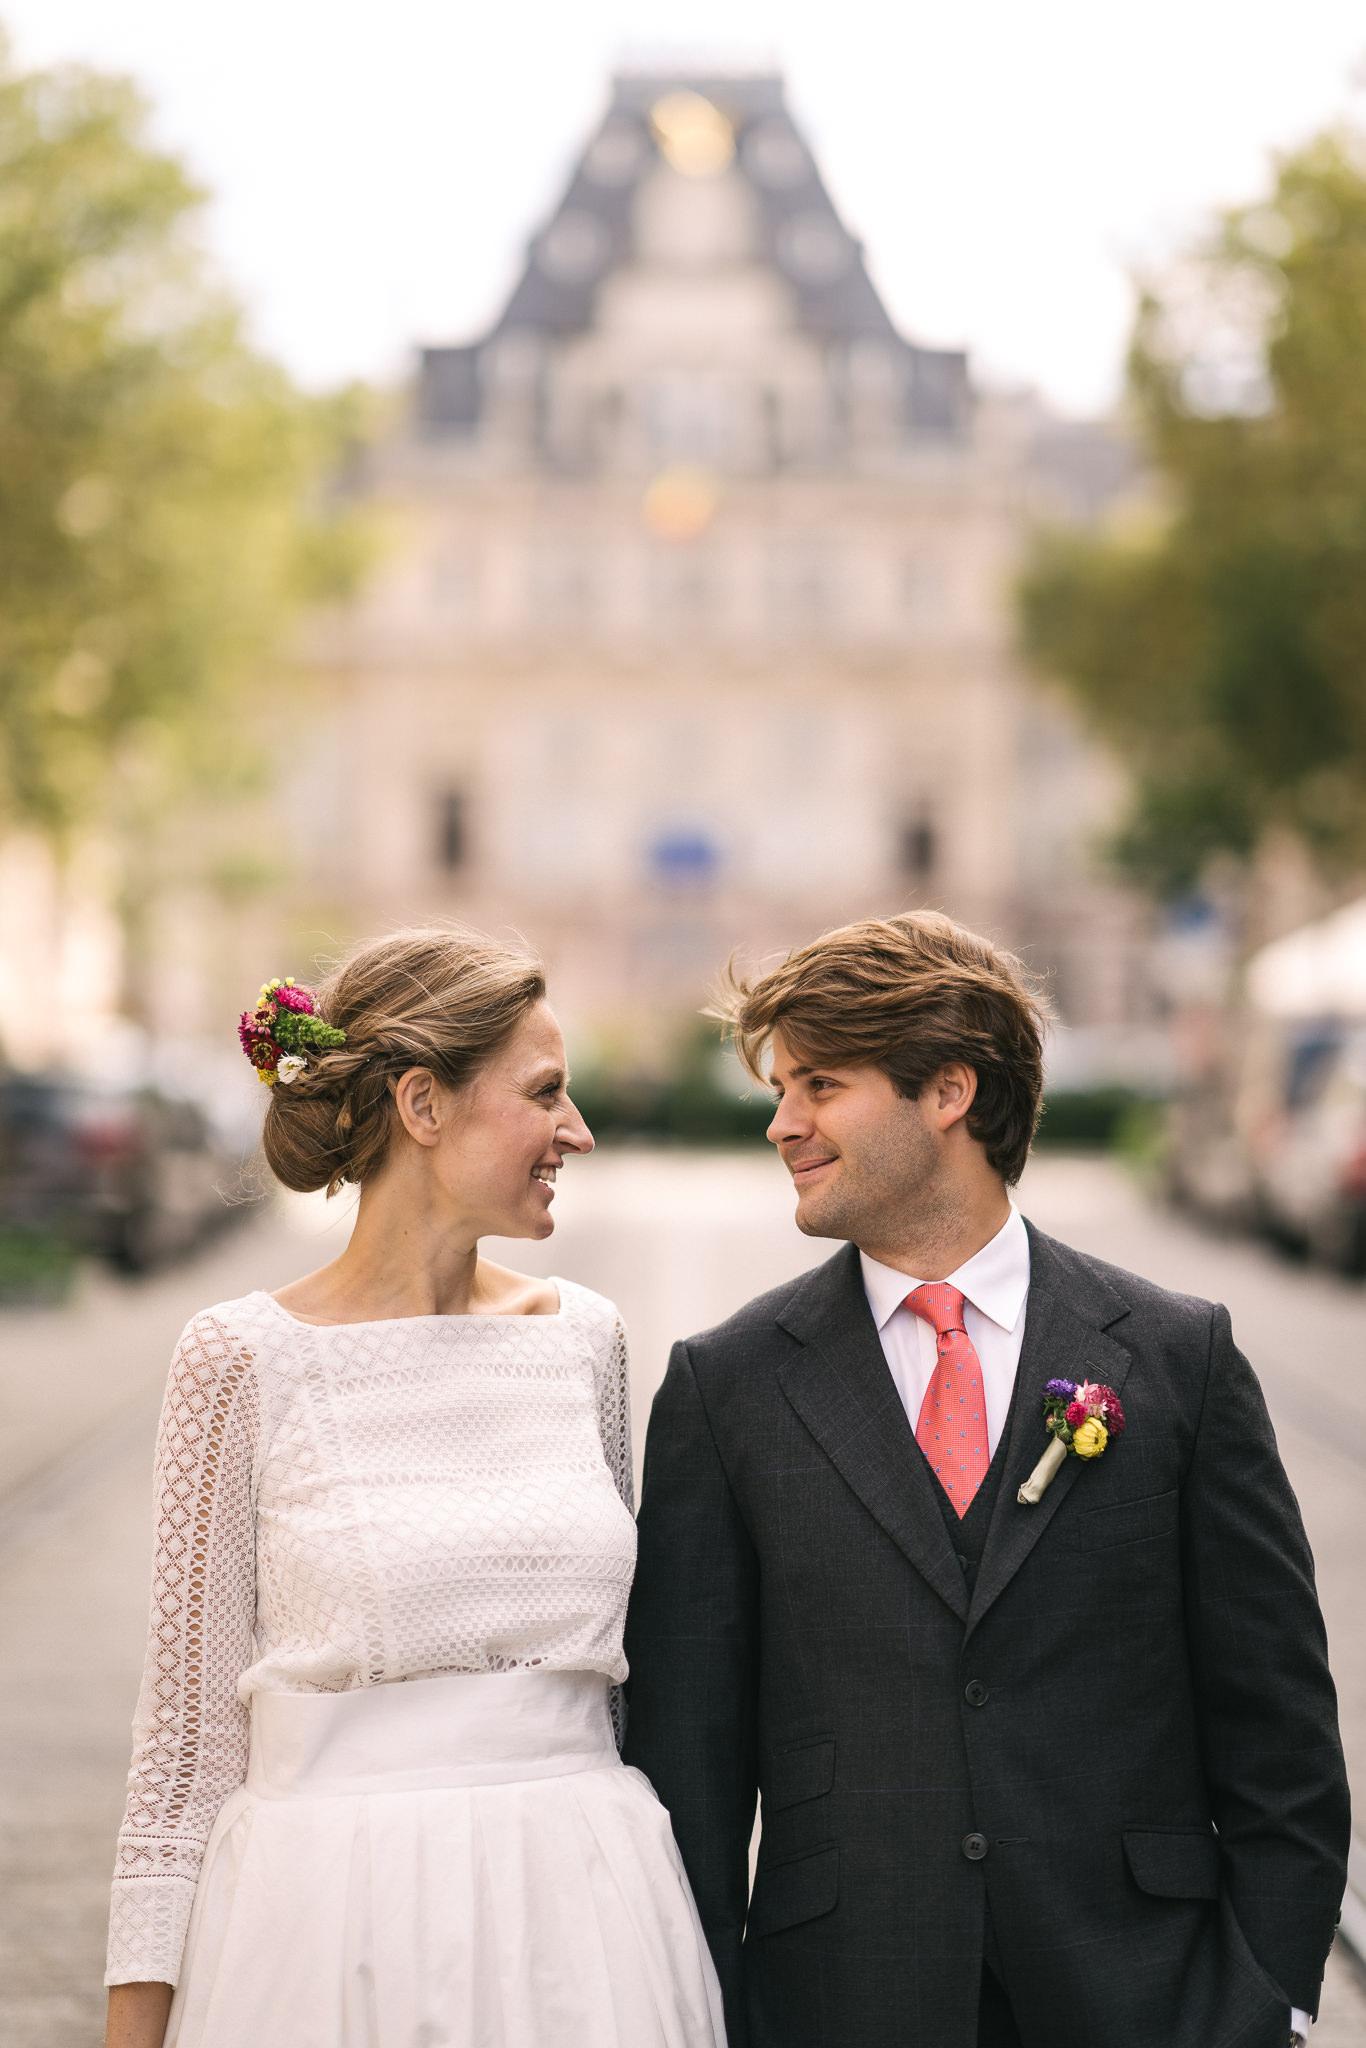 Wedding-Claudia&Philipp-15092018-small-128.jpg